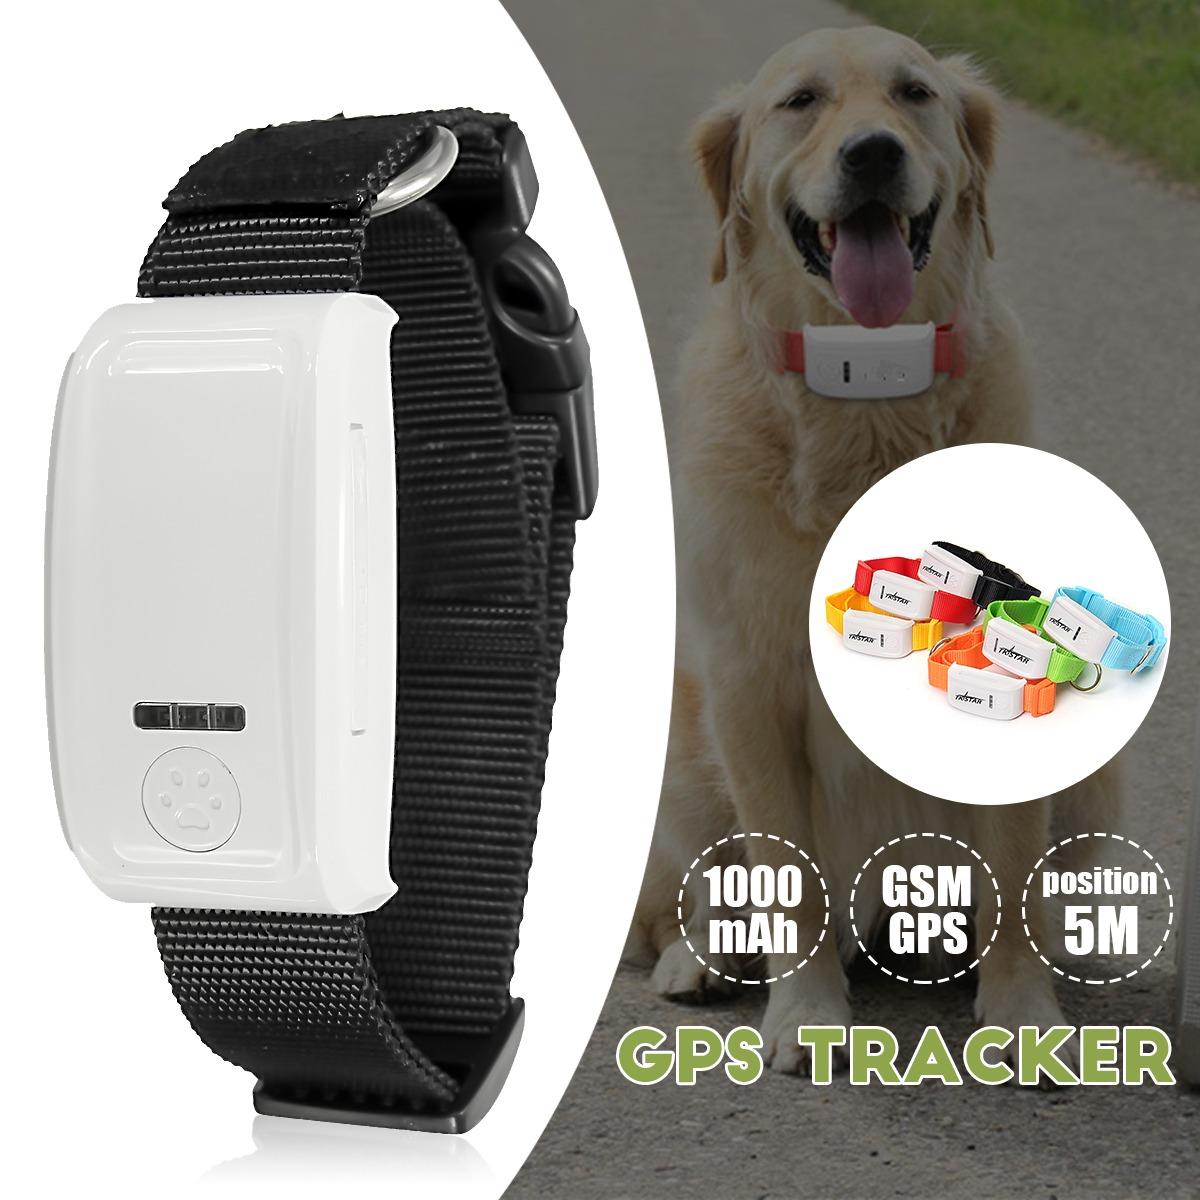 2b387a870 mascota gps / gsm rastreador collar impermeable perro gato e. Cargando zoom.